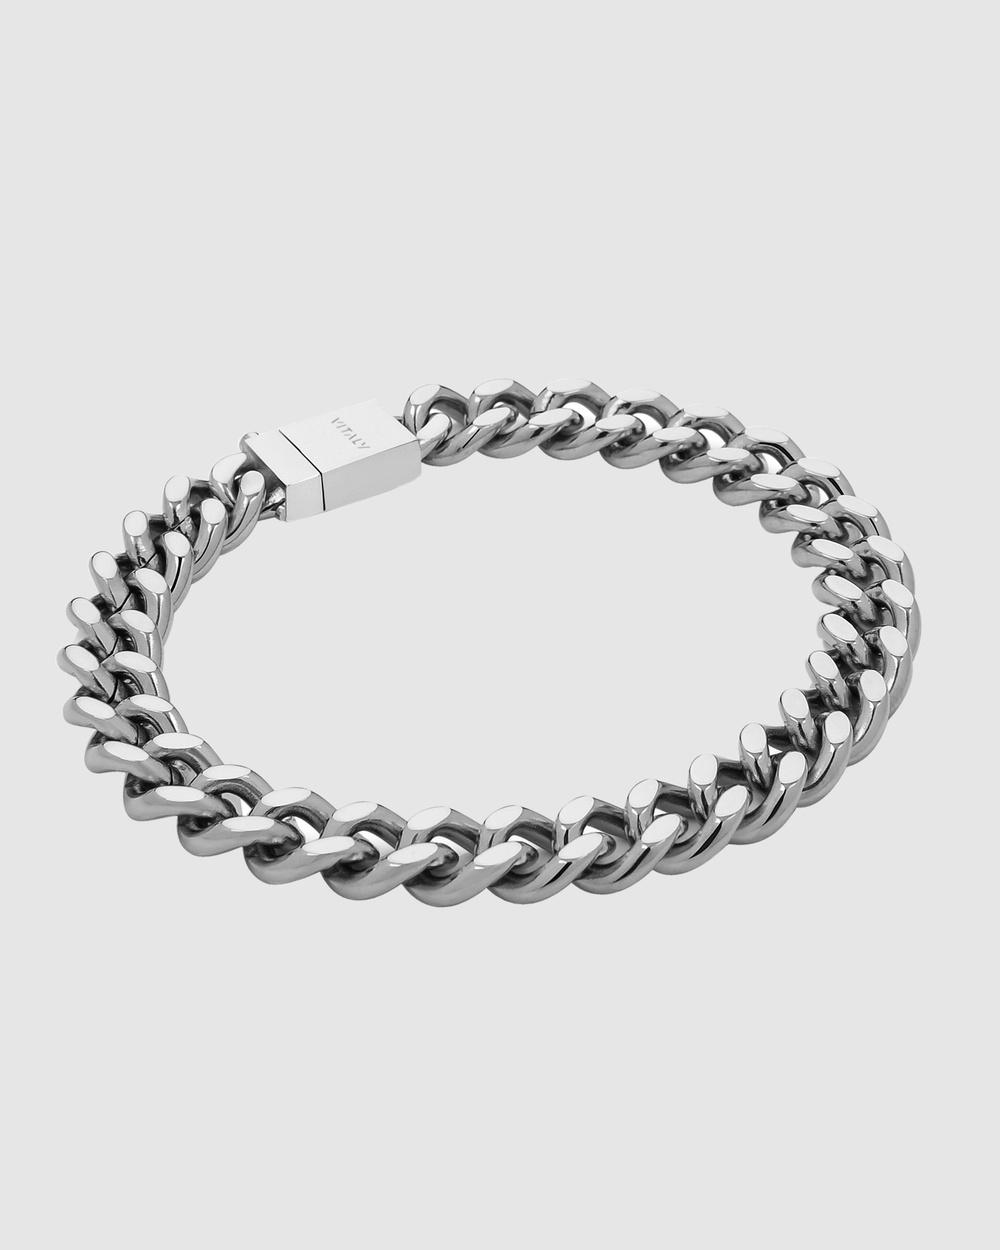 Vitaly Kickback Jewellery Stainless Steel